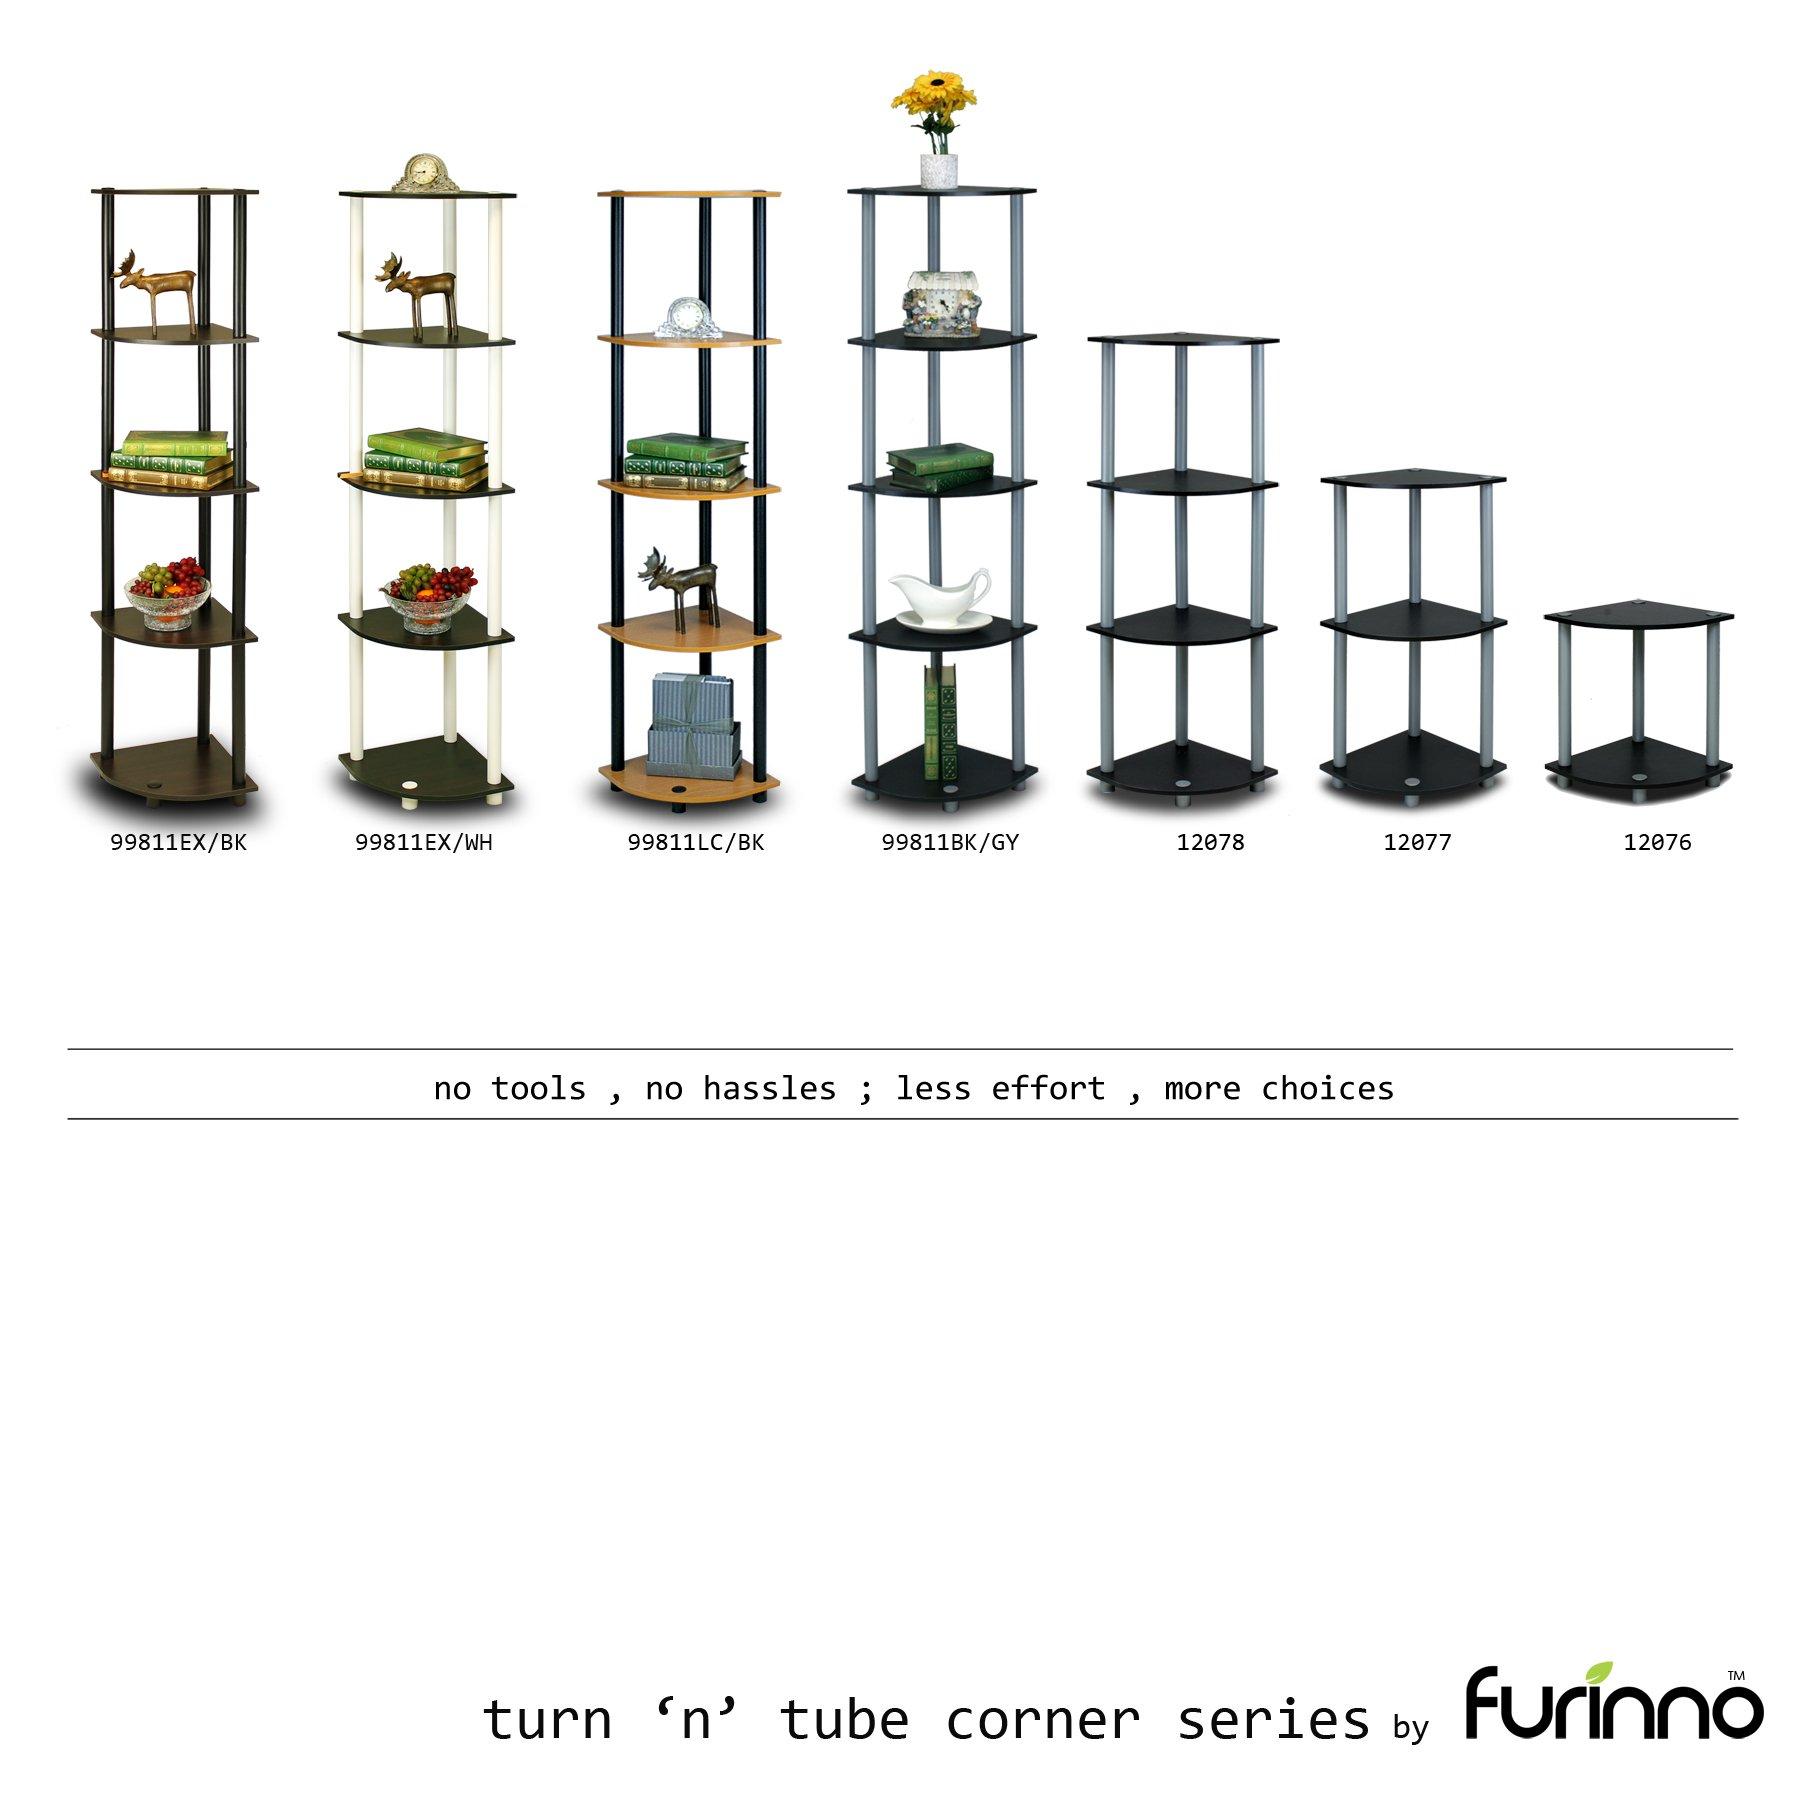 Furinno 99811DC/BK Turn-N-Tube 5 Tier Corner Shelf, Dark Cherry/Black